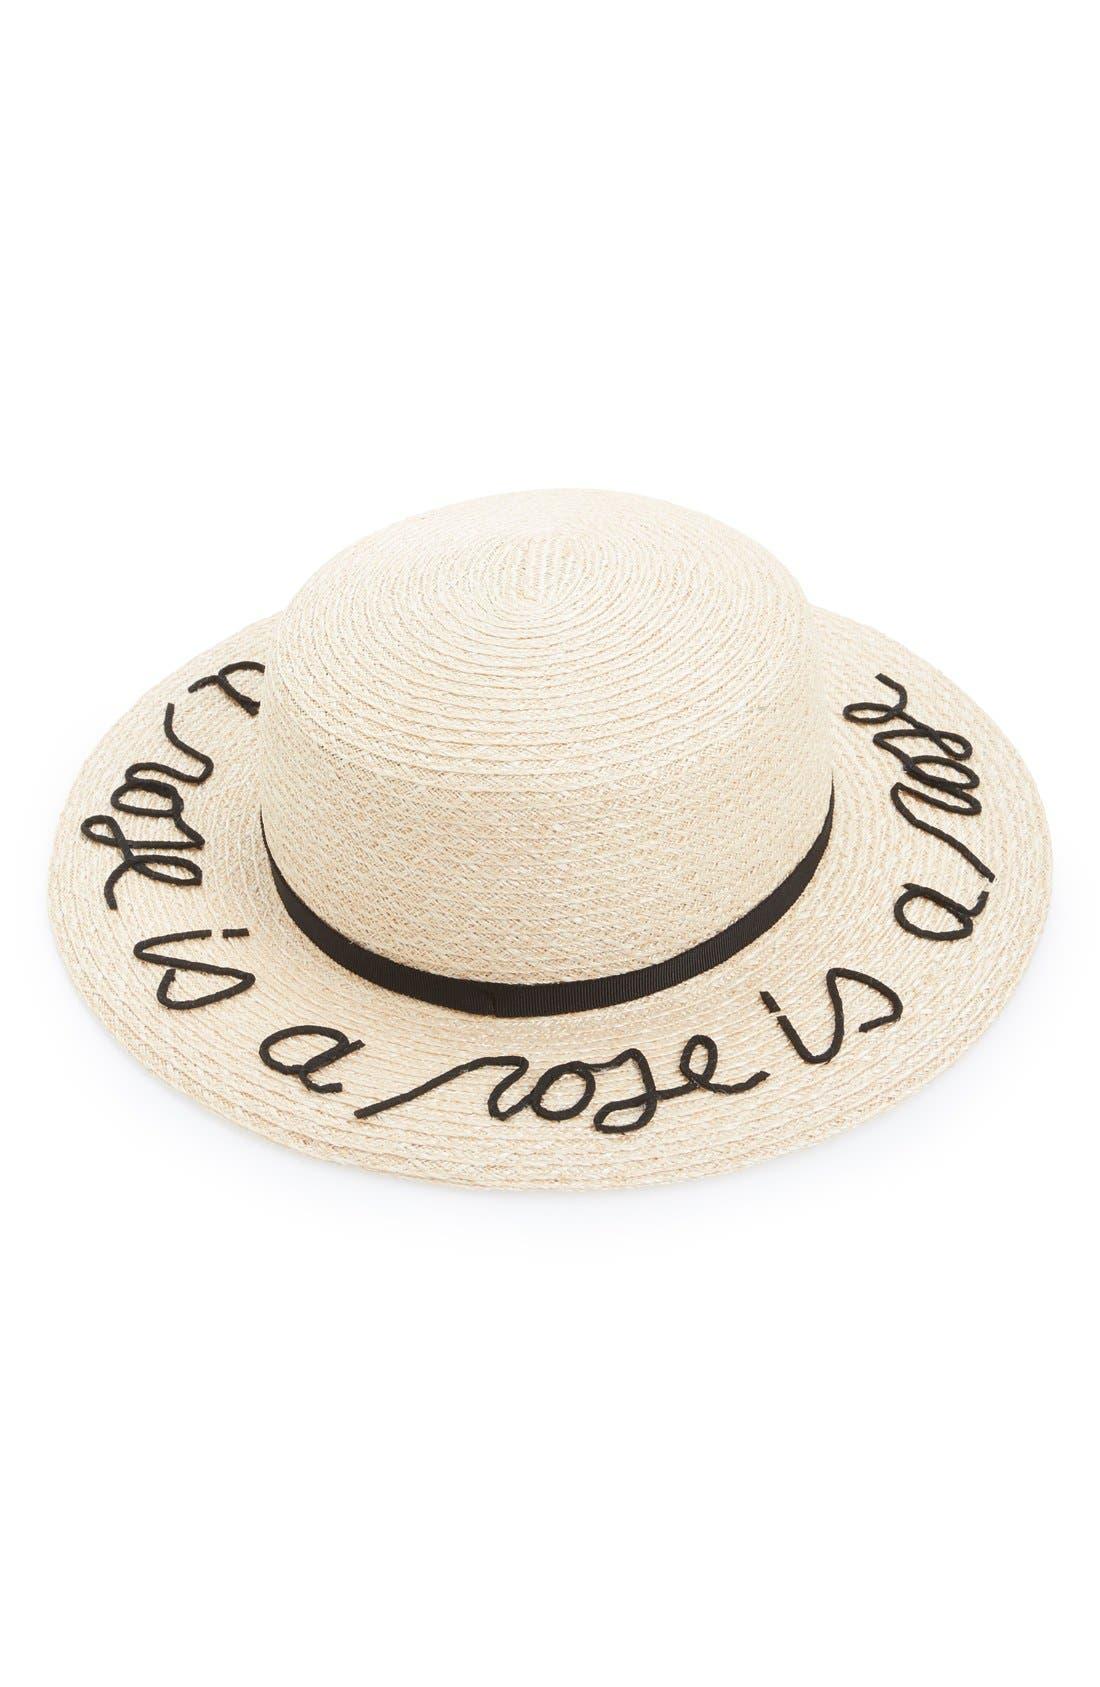 'Brigitte - A Rose is a Rose is a Rose' Hemp & Cotton Boater Hat,                             Main thumbnail 1, color,                             250